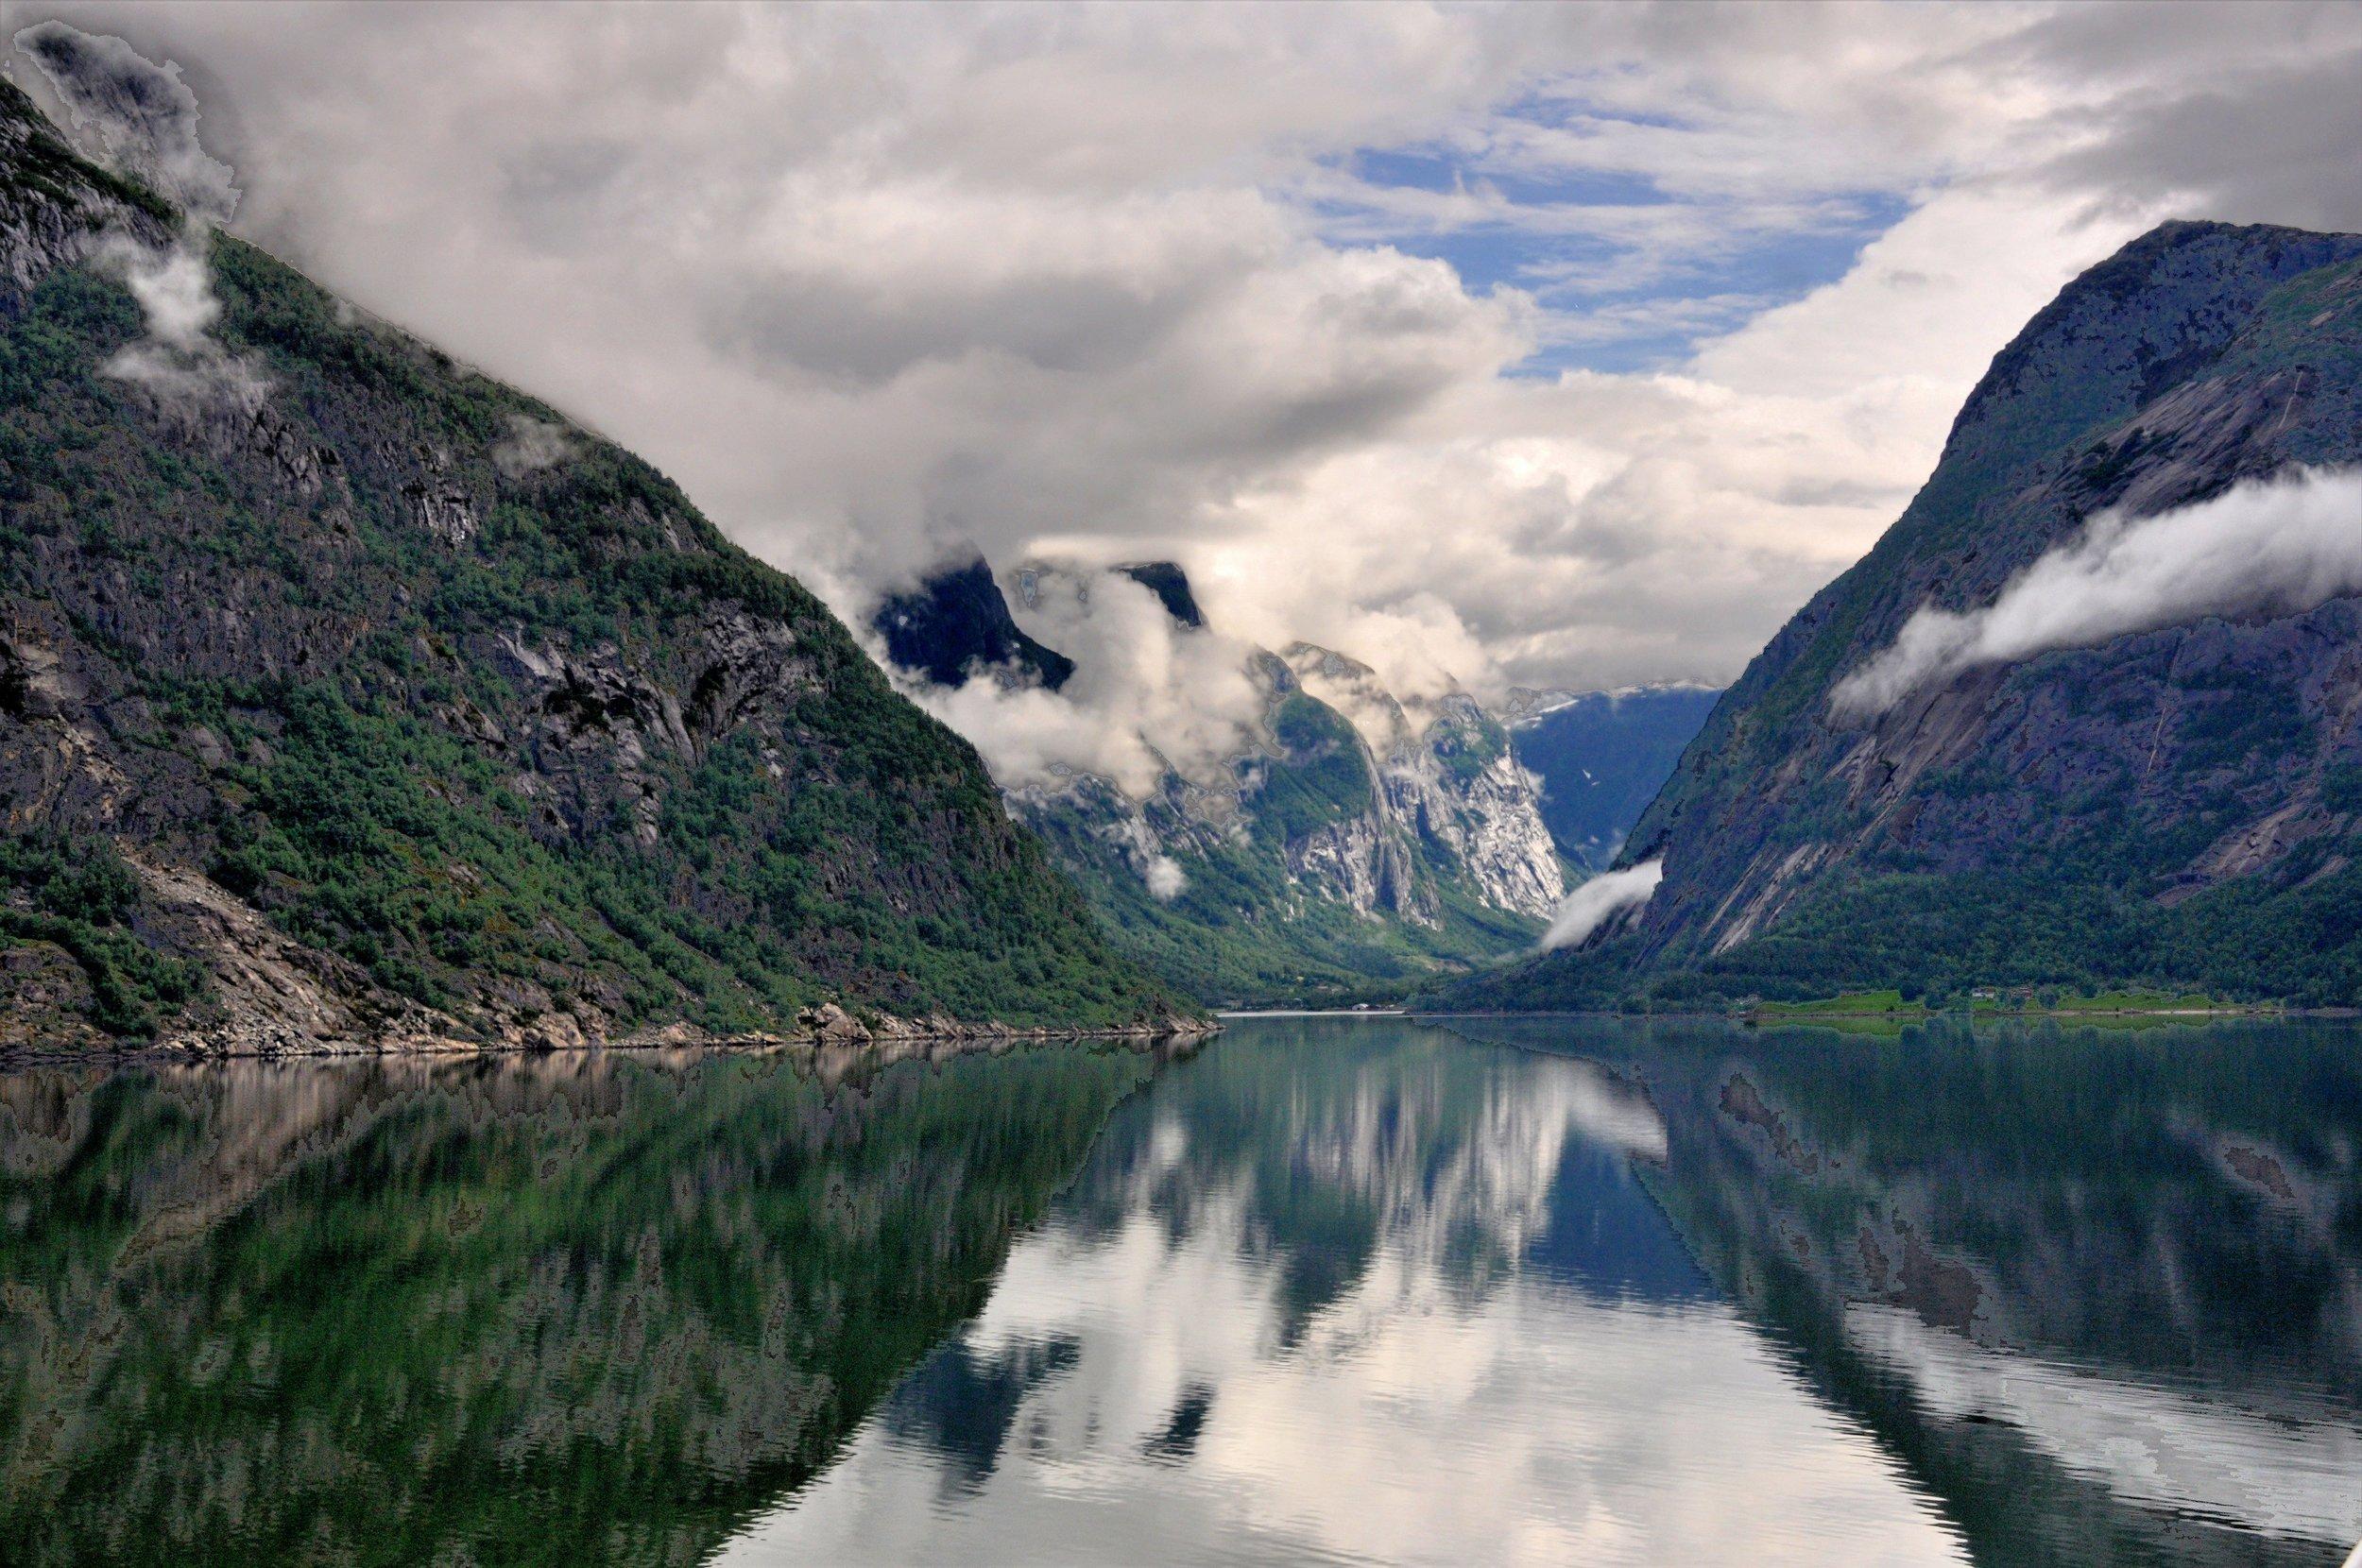 clouds-daylight-fjord-631296.jpg